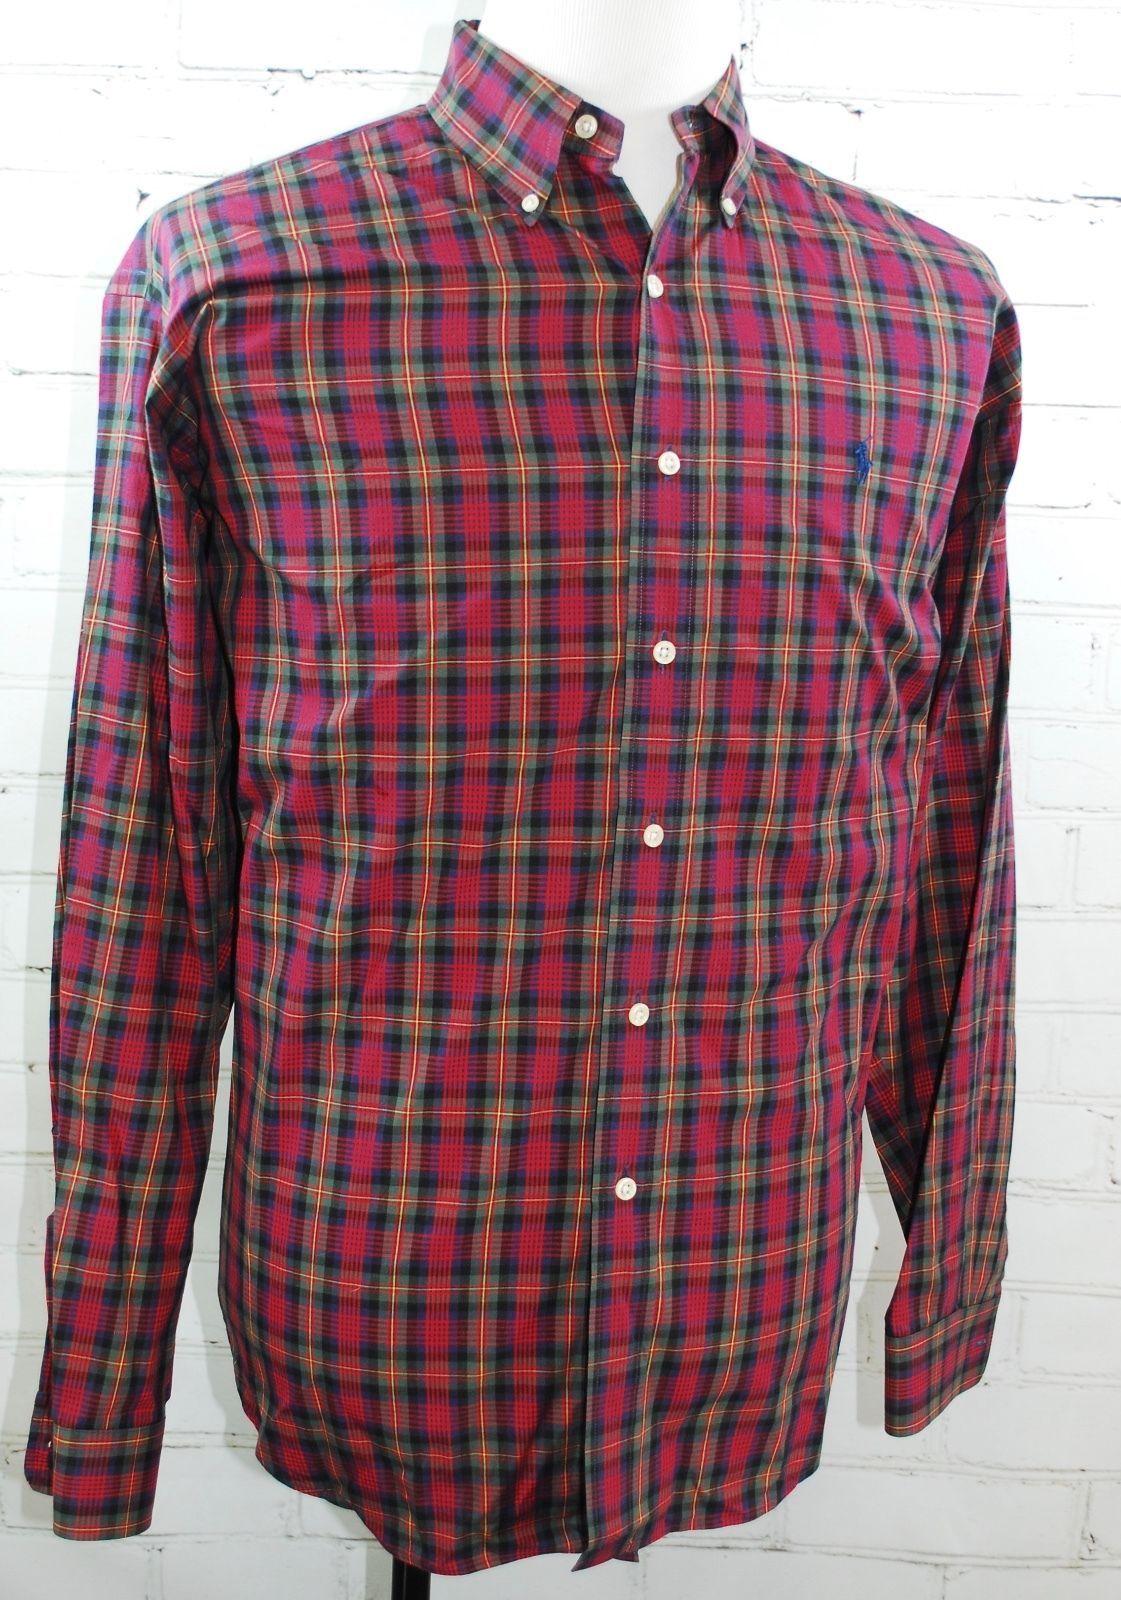 527c30682 57. 57. Previous. Ralph Lauren BLAKE Button Down Red   Navy Plaid Shirt -  100% Cotton Men s Large